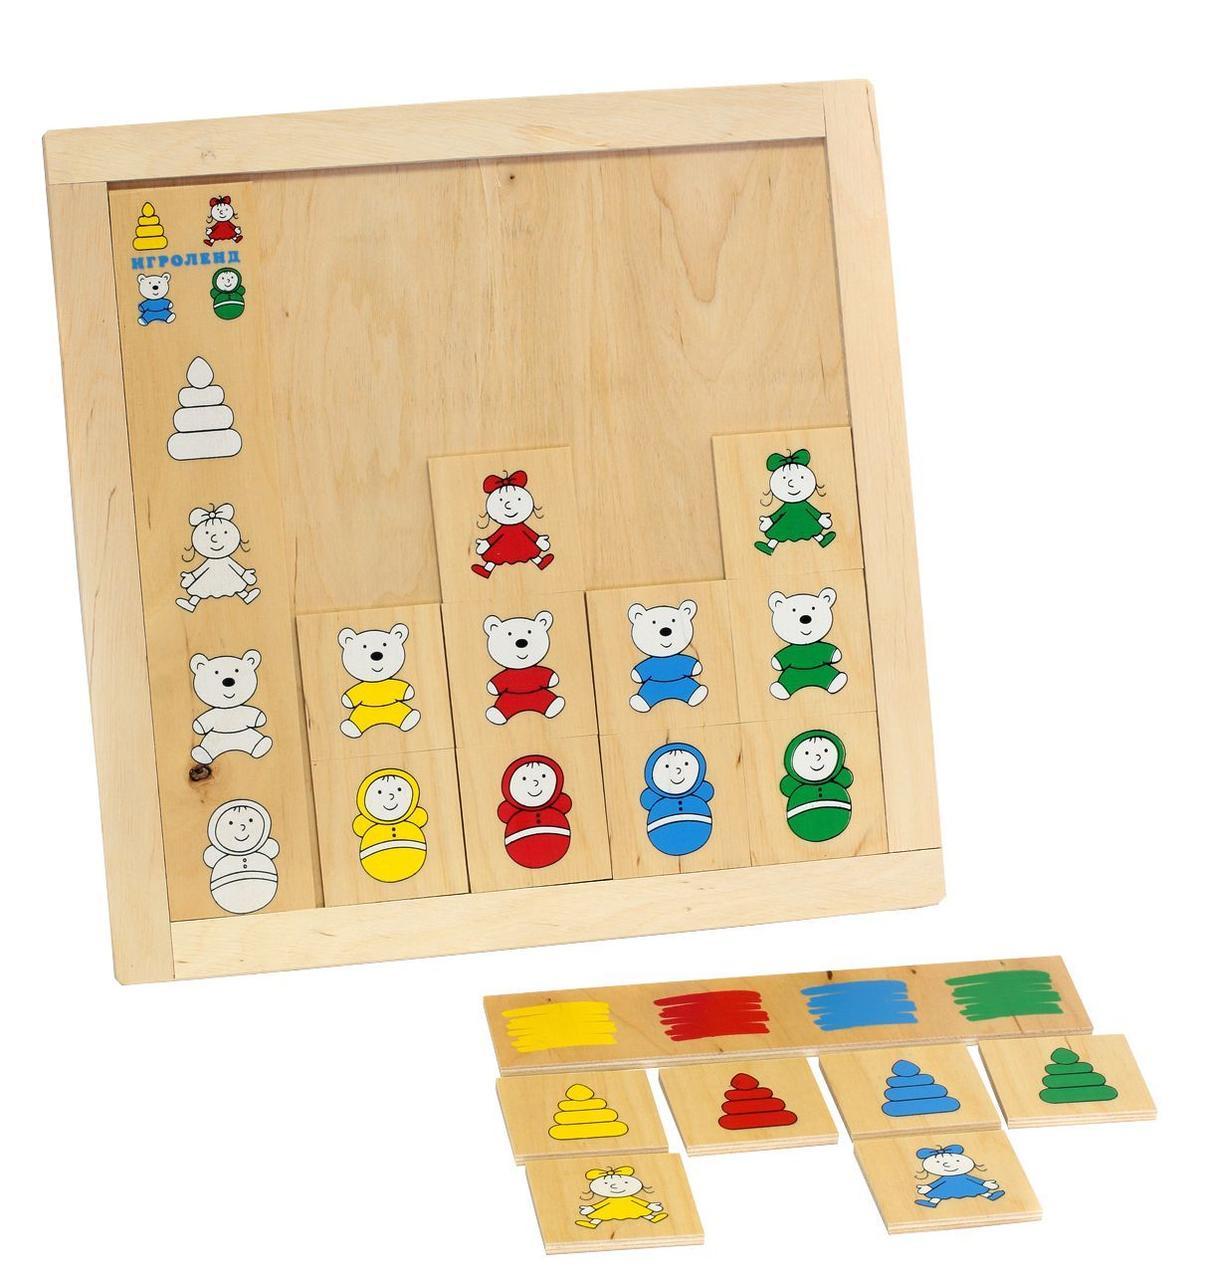 Классификация Подбери игрушку 18 деталей 27.00х27.00х0.90